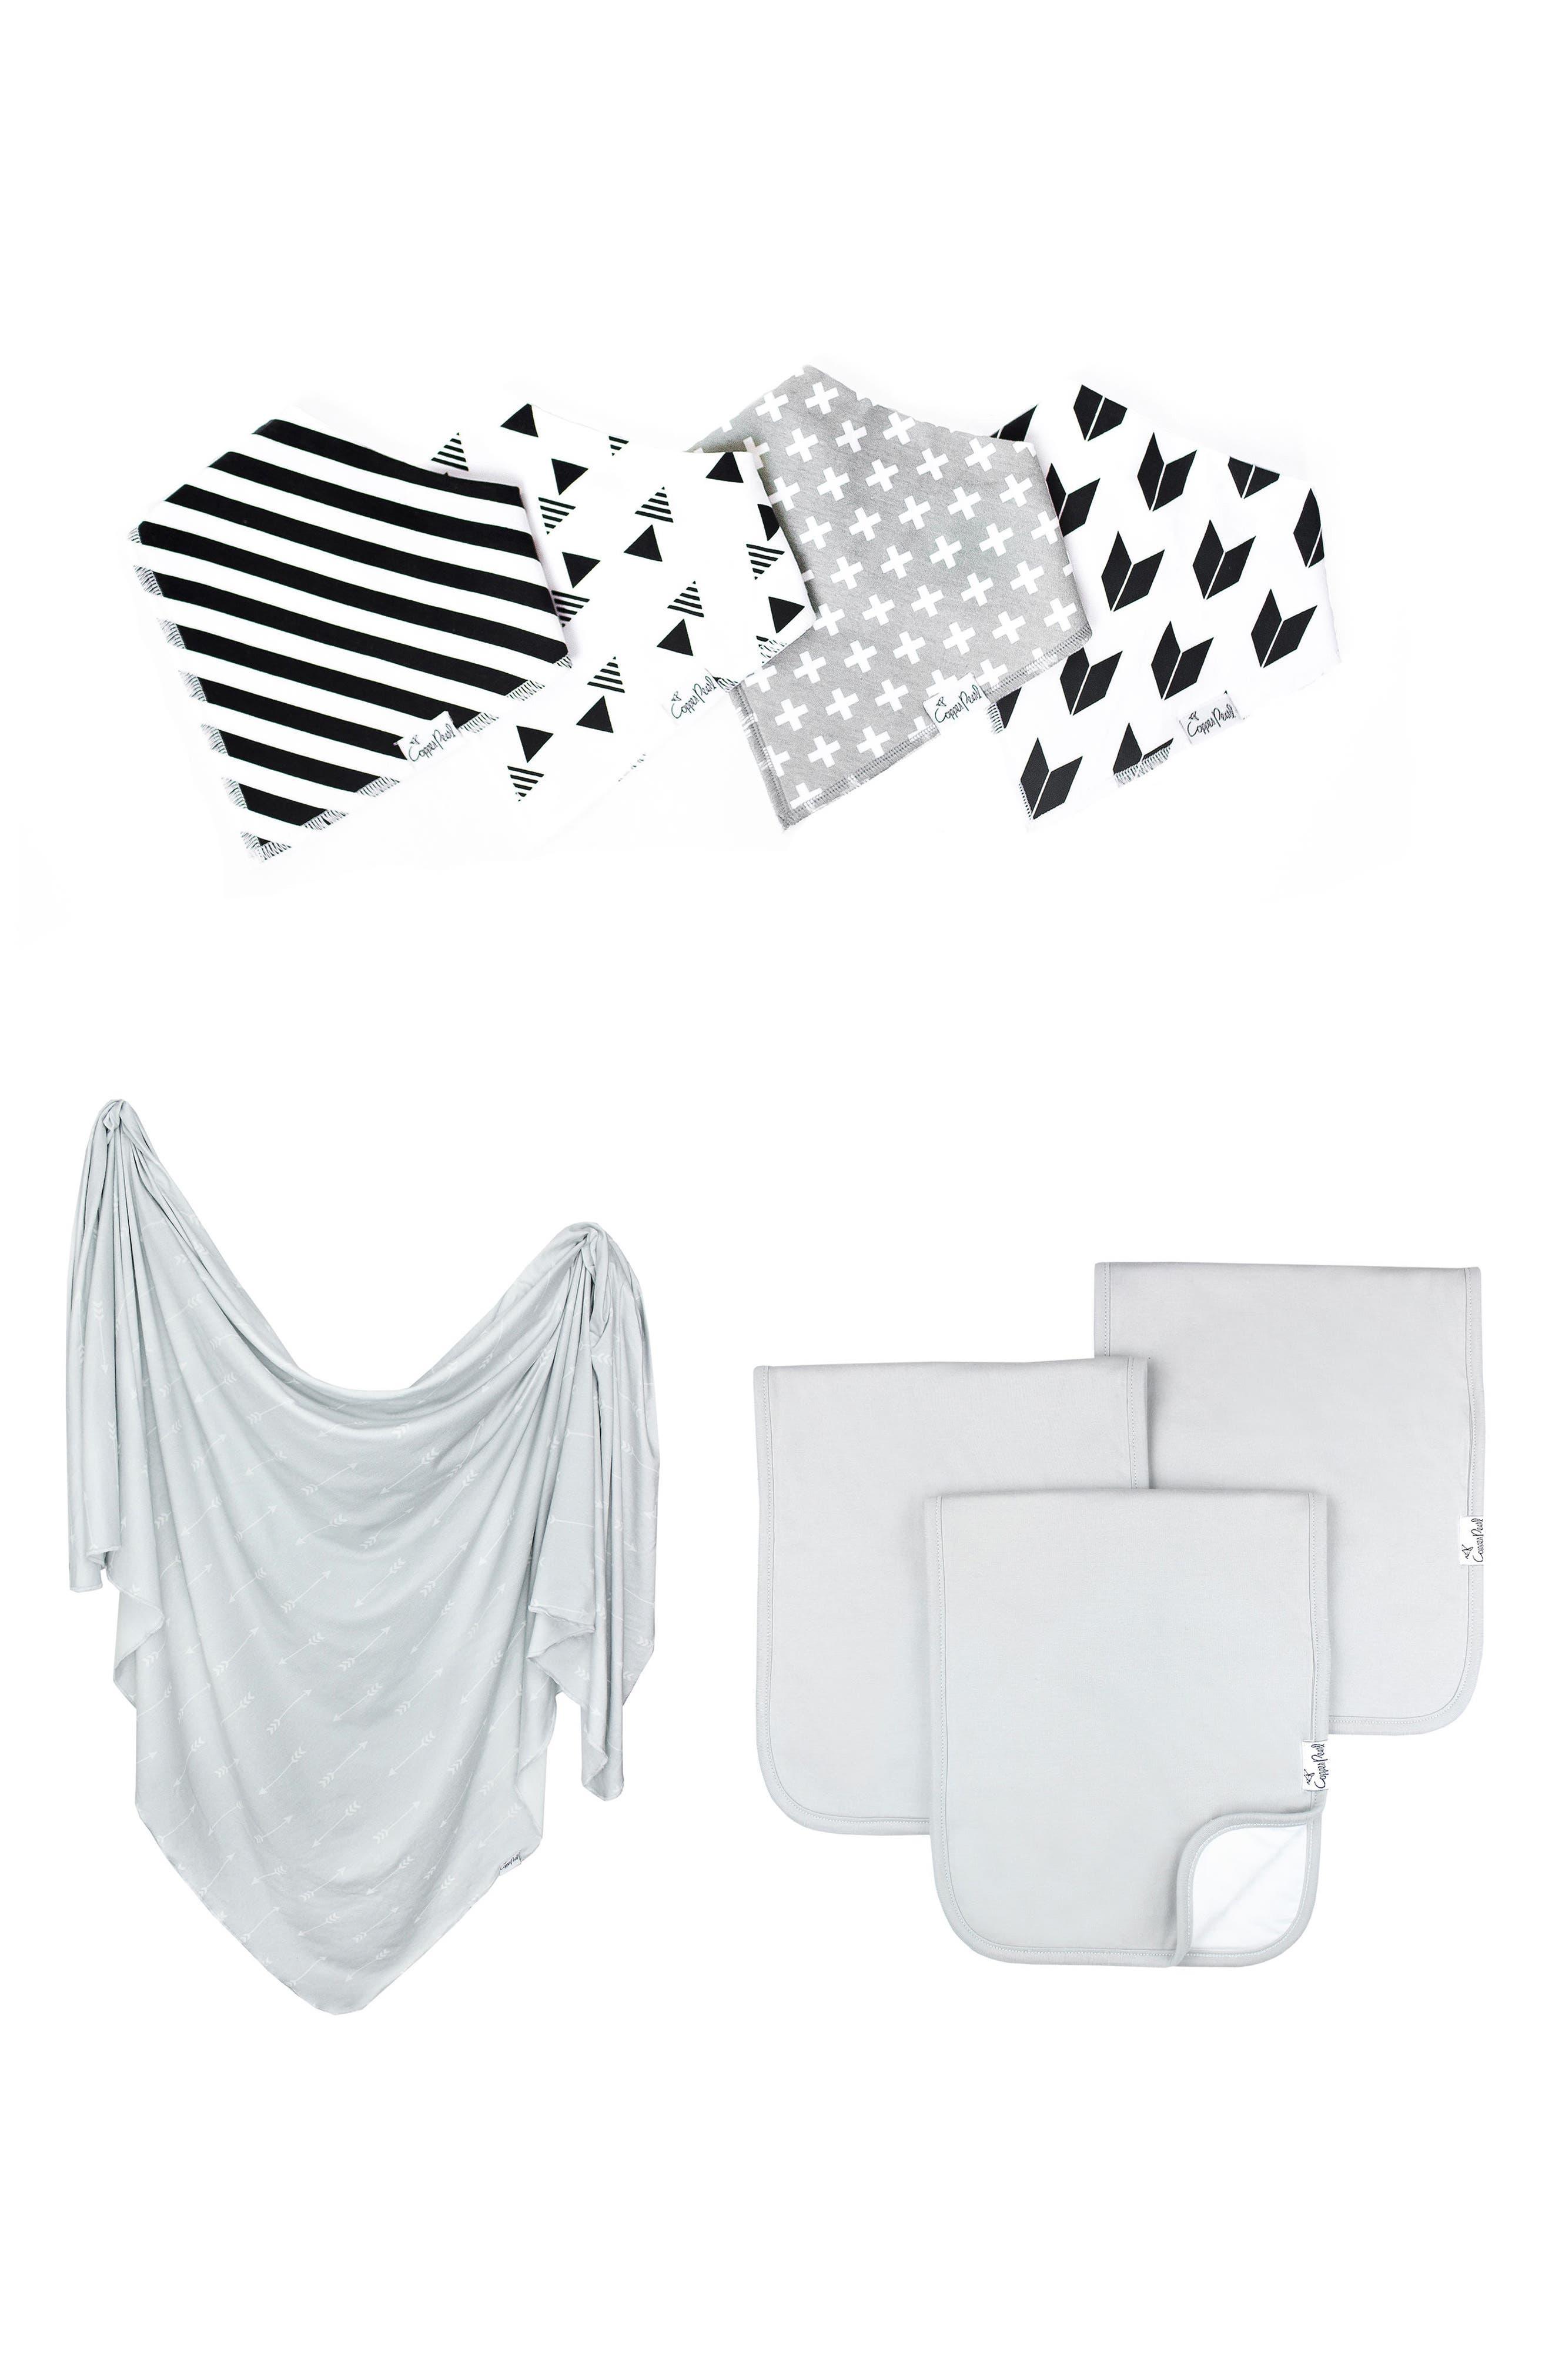 Alternate Image 1 Selected - Copper Pearl Shade Bib, Burp Cloth & Swaddle Blanket Gift Set